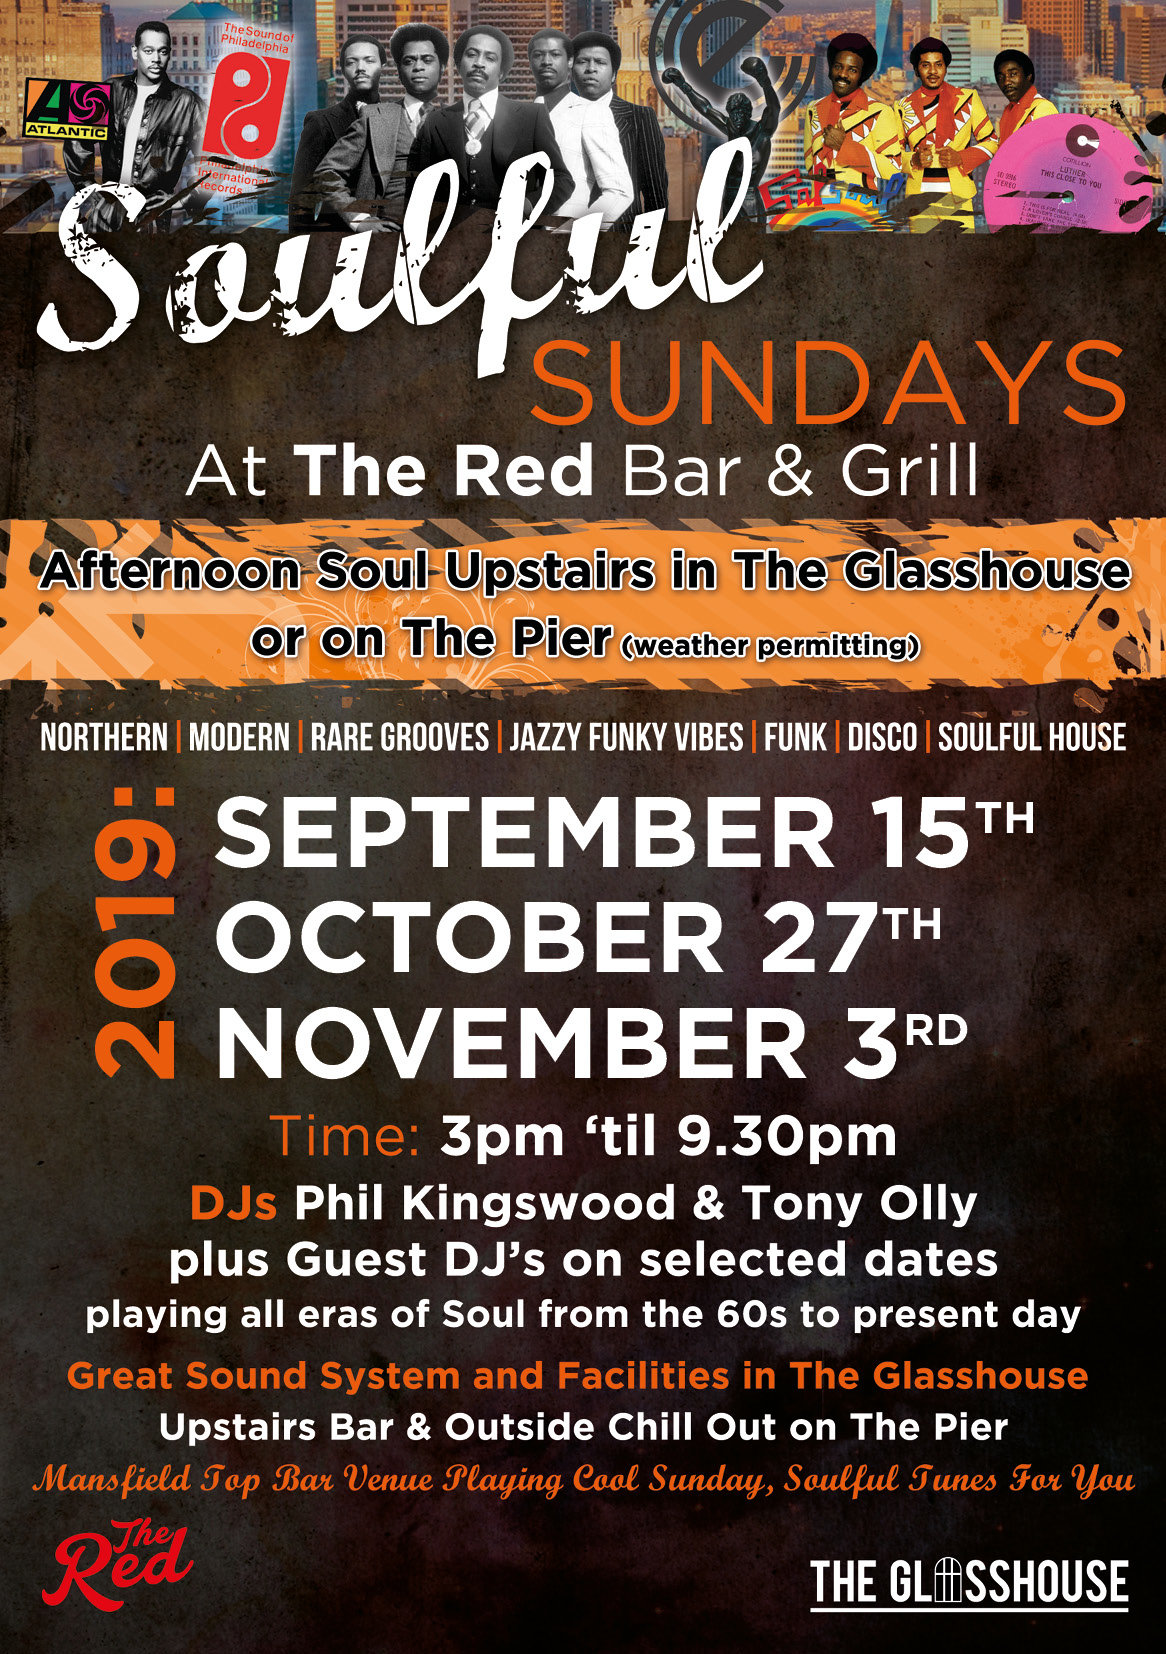 Red Bar Sunday Soul flyer